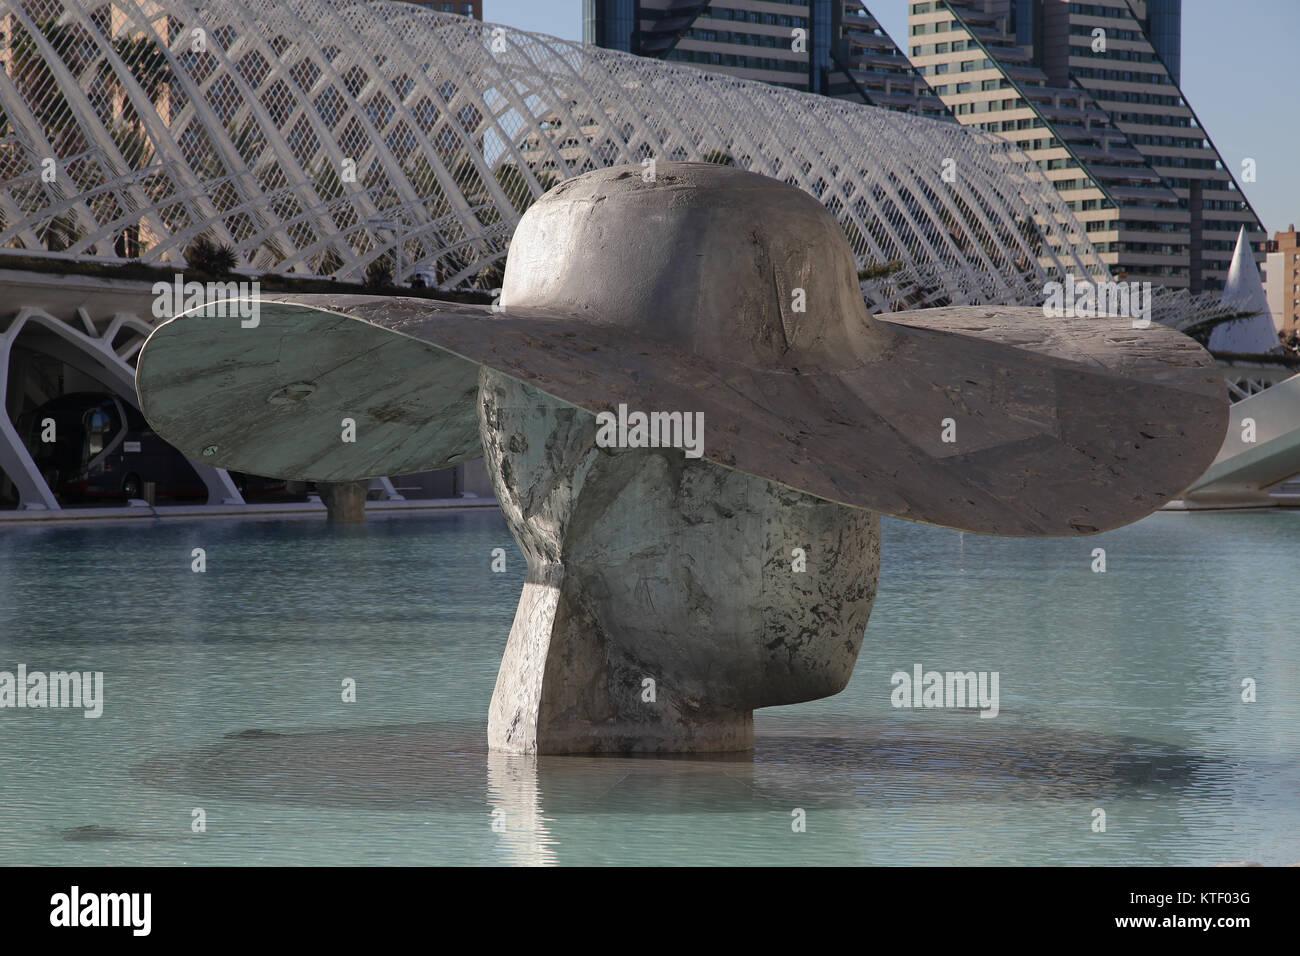 Ciudad de las Artes y las Ciencias.La Cité des Arts et des Sciences de Valence Espagne.par Santiago Calatrava et Banque D'Images